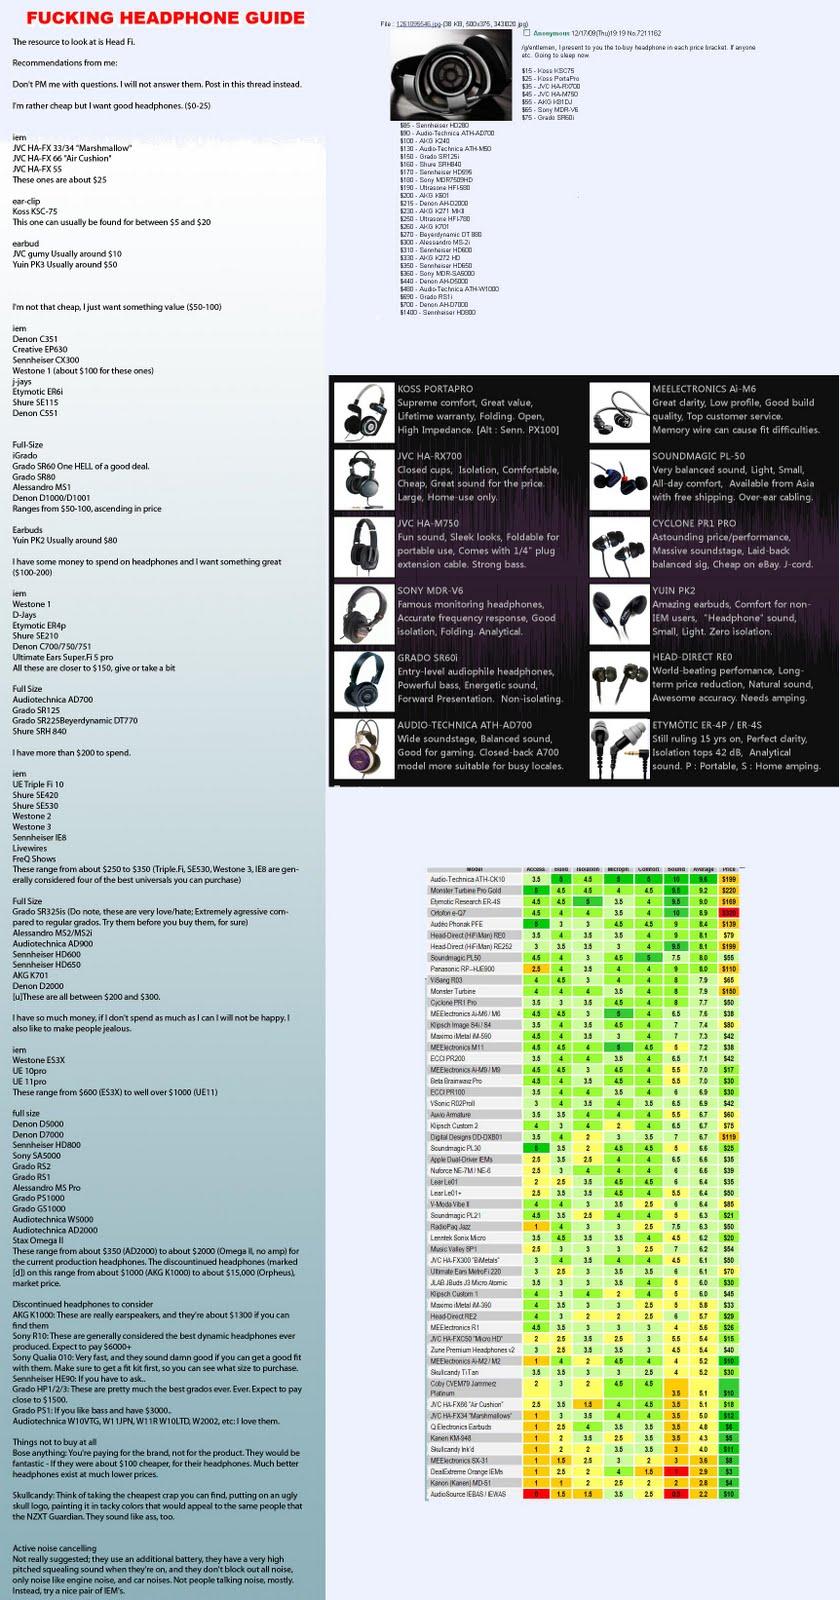 Headphone Guide 4Chan